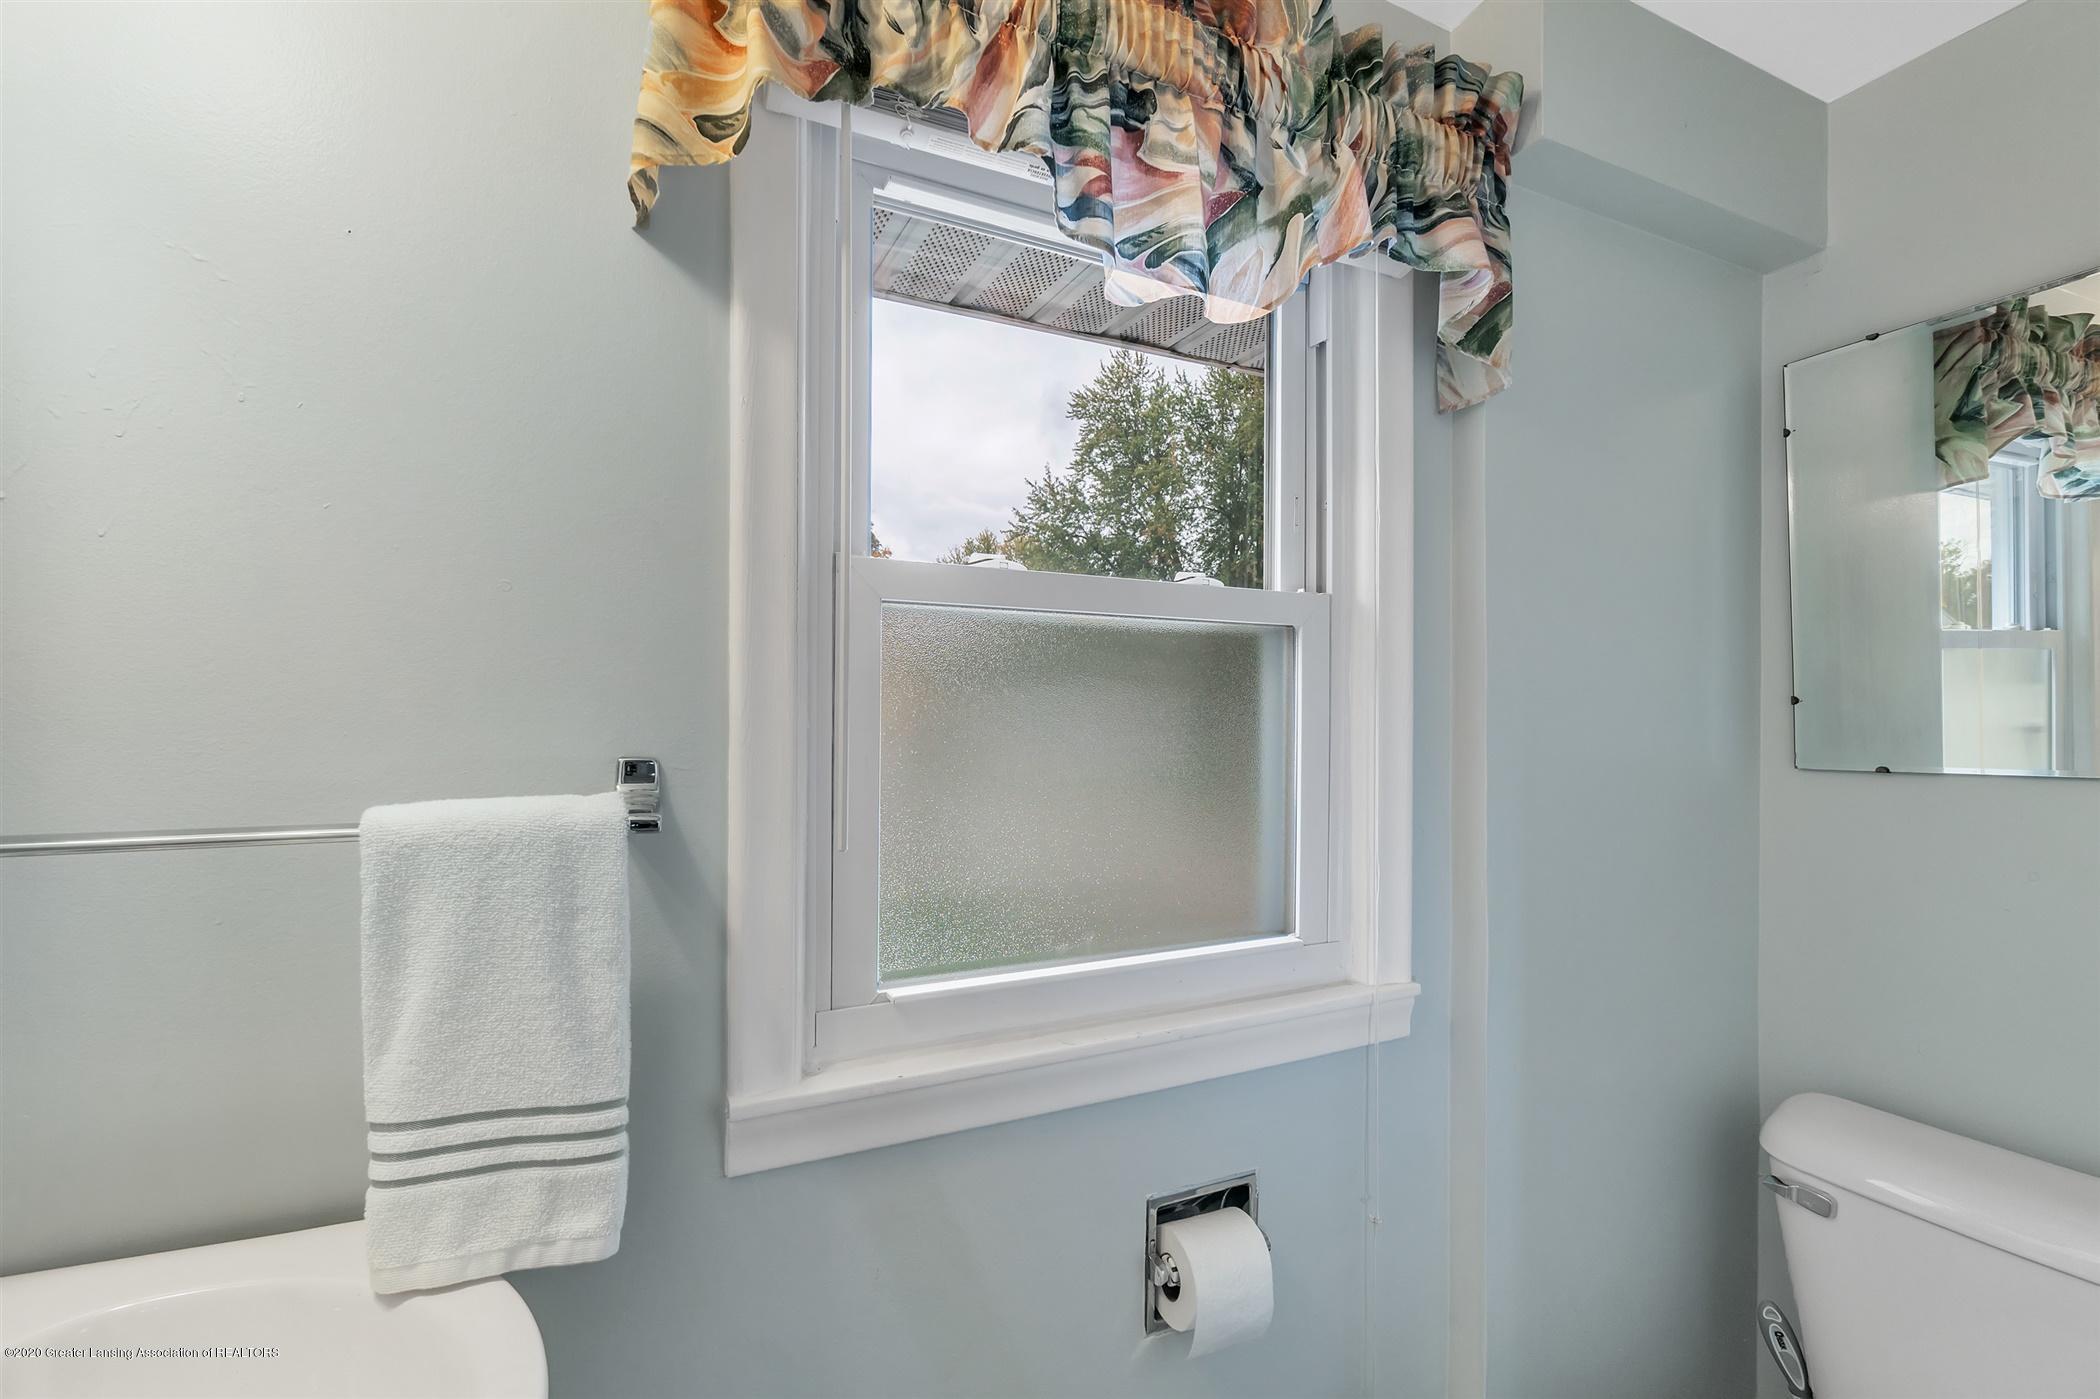 4385 Holt Rd - 41-4385 Holt Rd.-WindowStill-Real-E - 41